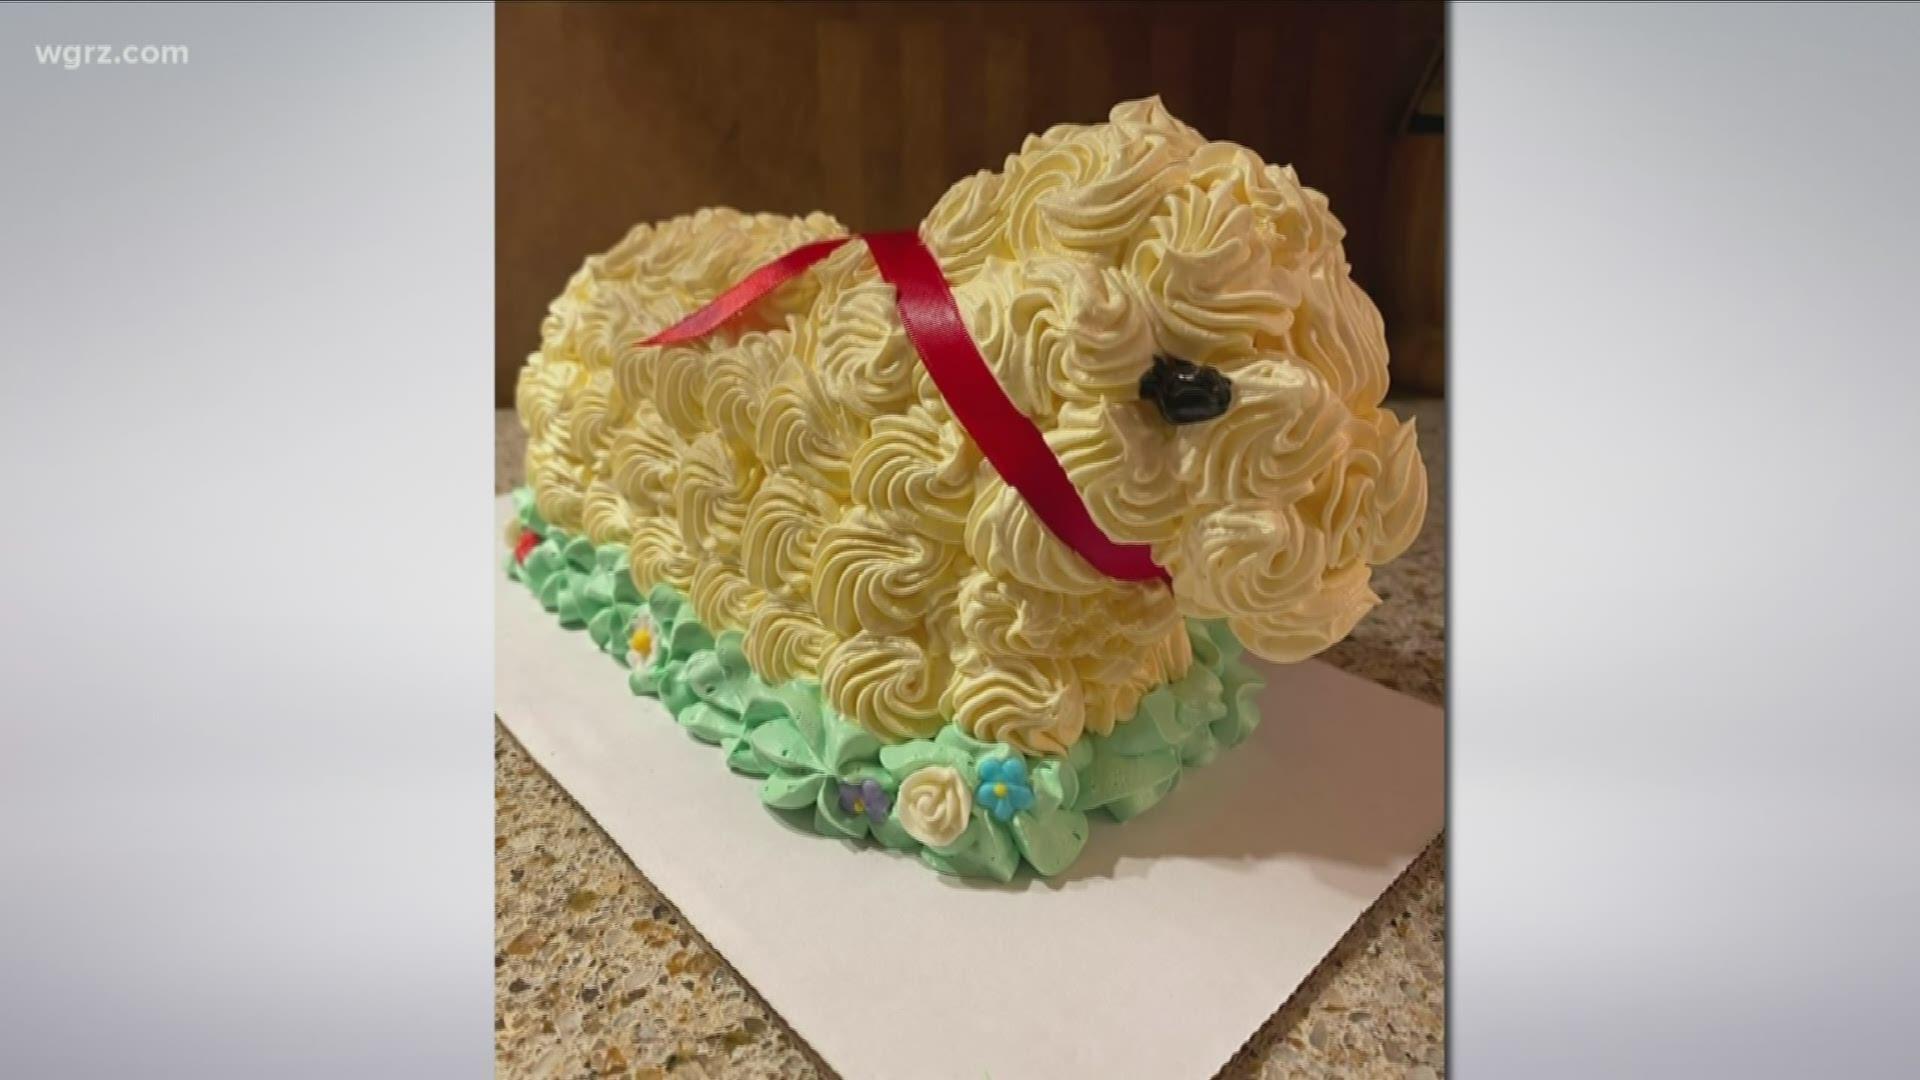 Enjoyable Lake Effect Ice Cream Making Butter Lamb Ice Cream Cakes For Funny Birthday Cards Online Ioscodamsfinfo